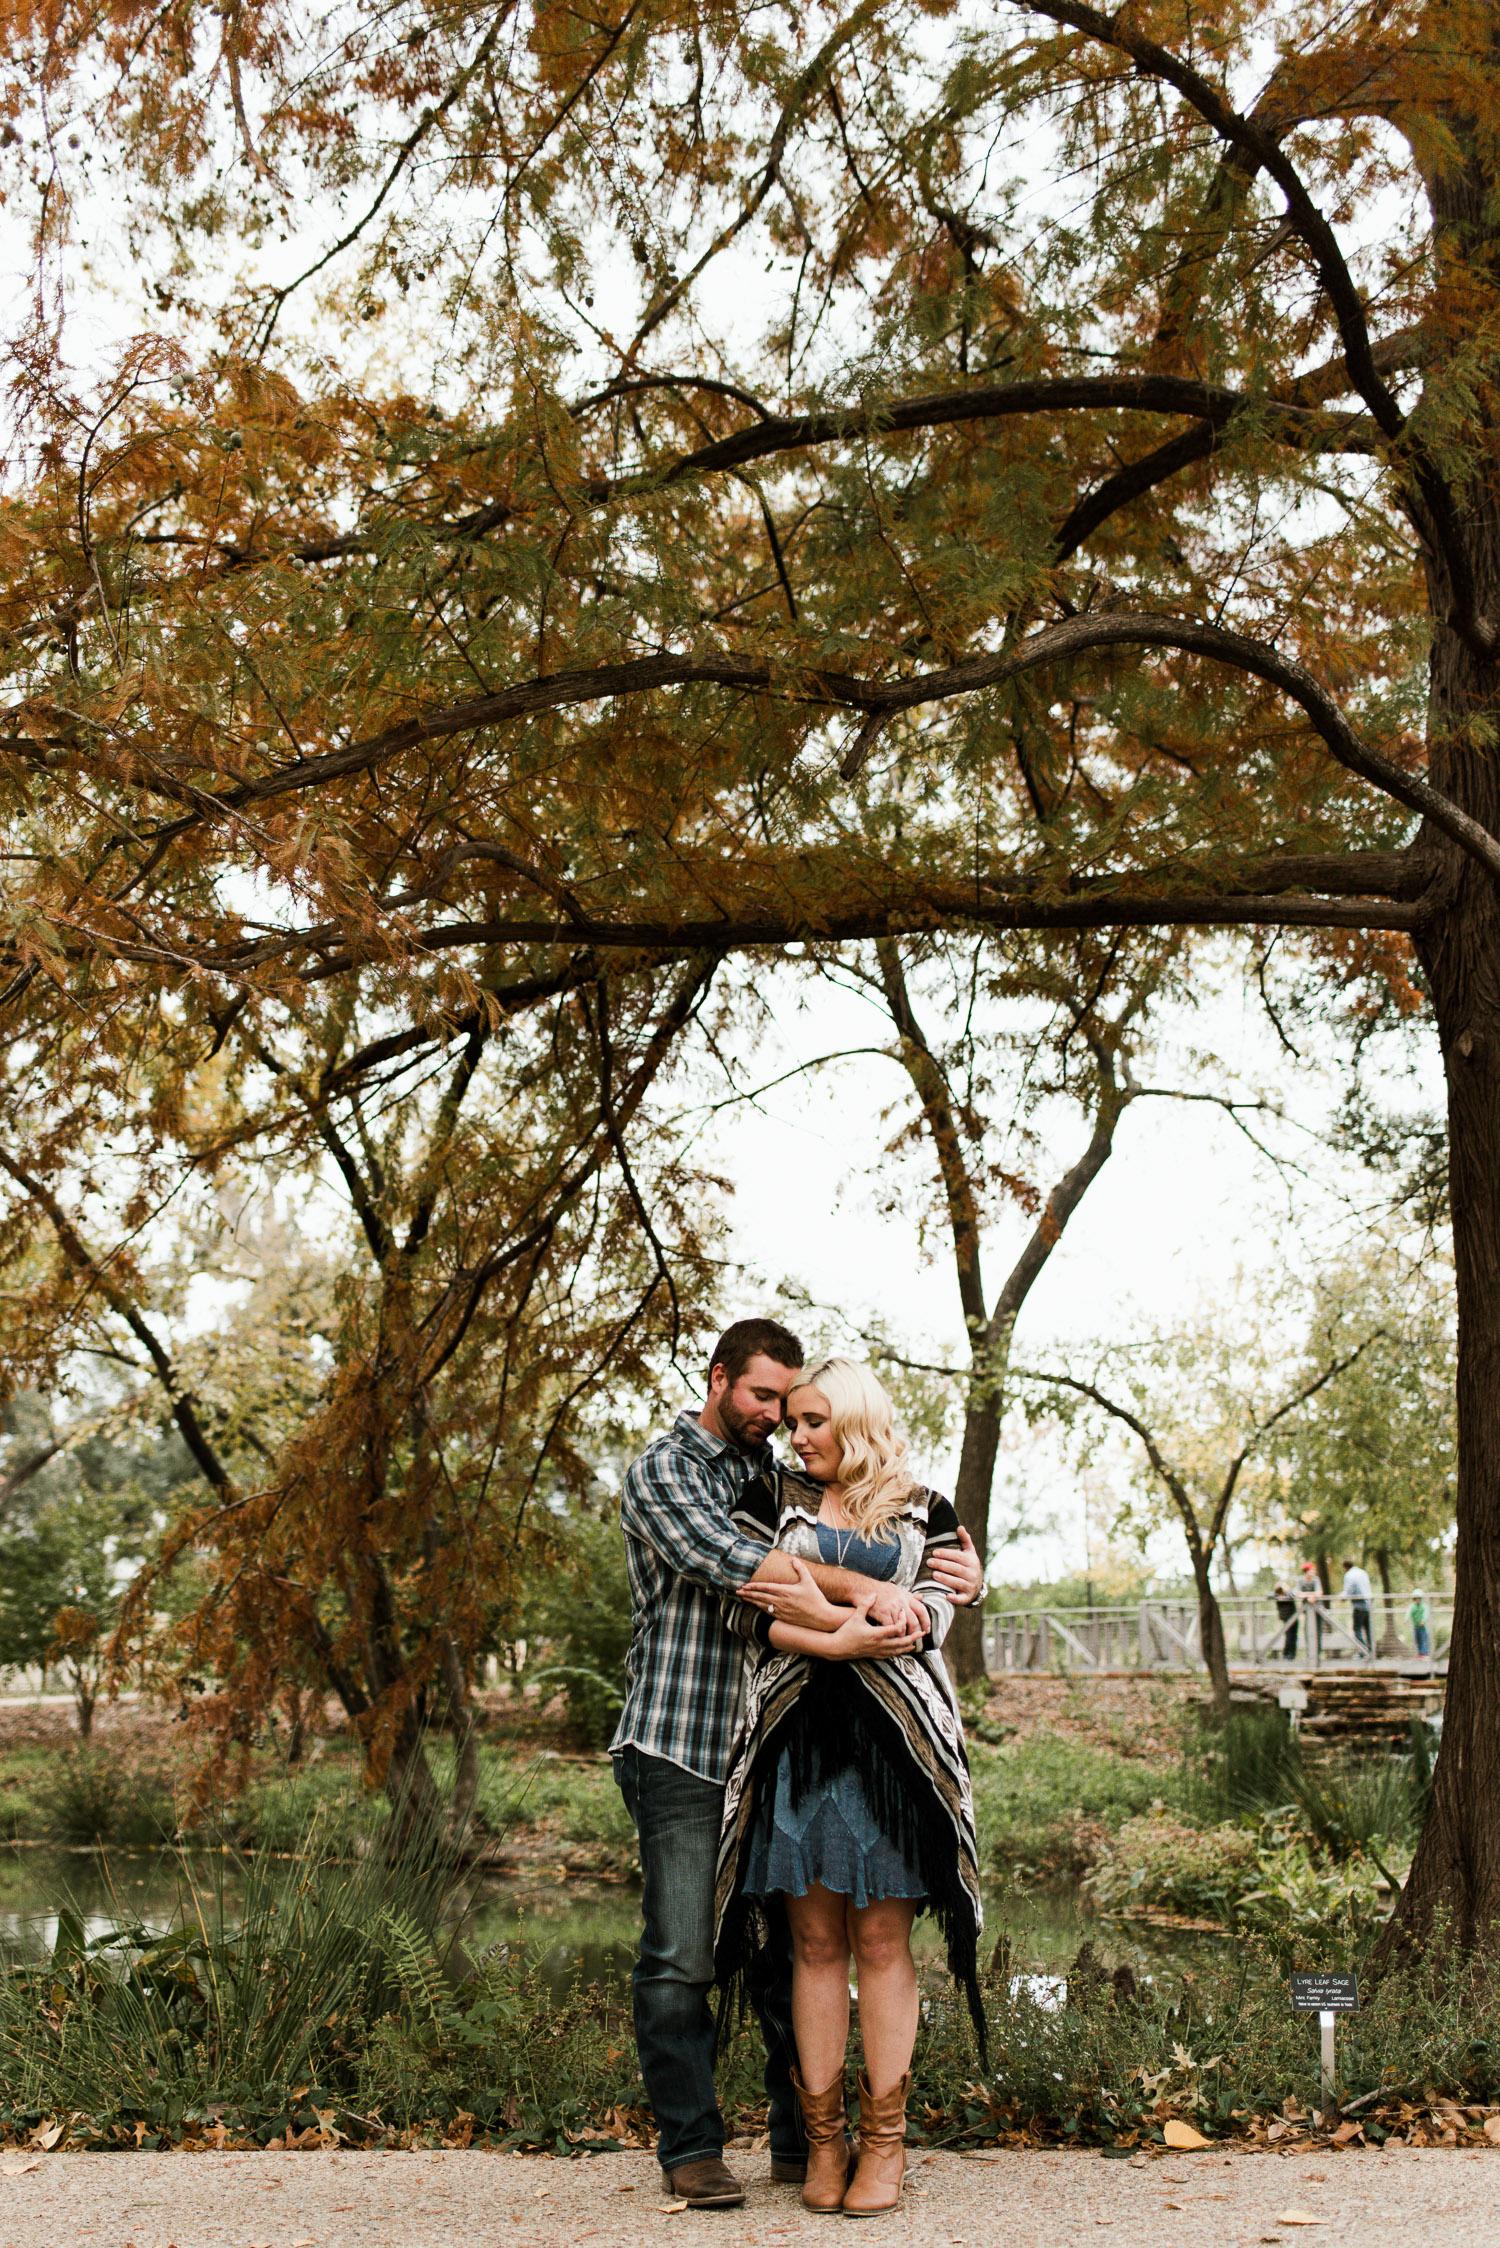 morgan - erich - nelson - botanic - gardens - fort - worth - texas-20.jpg